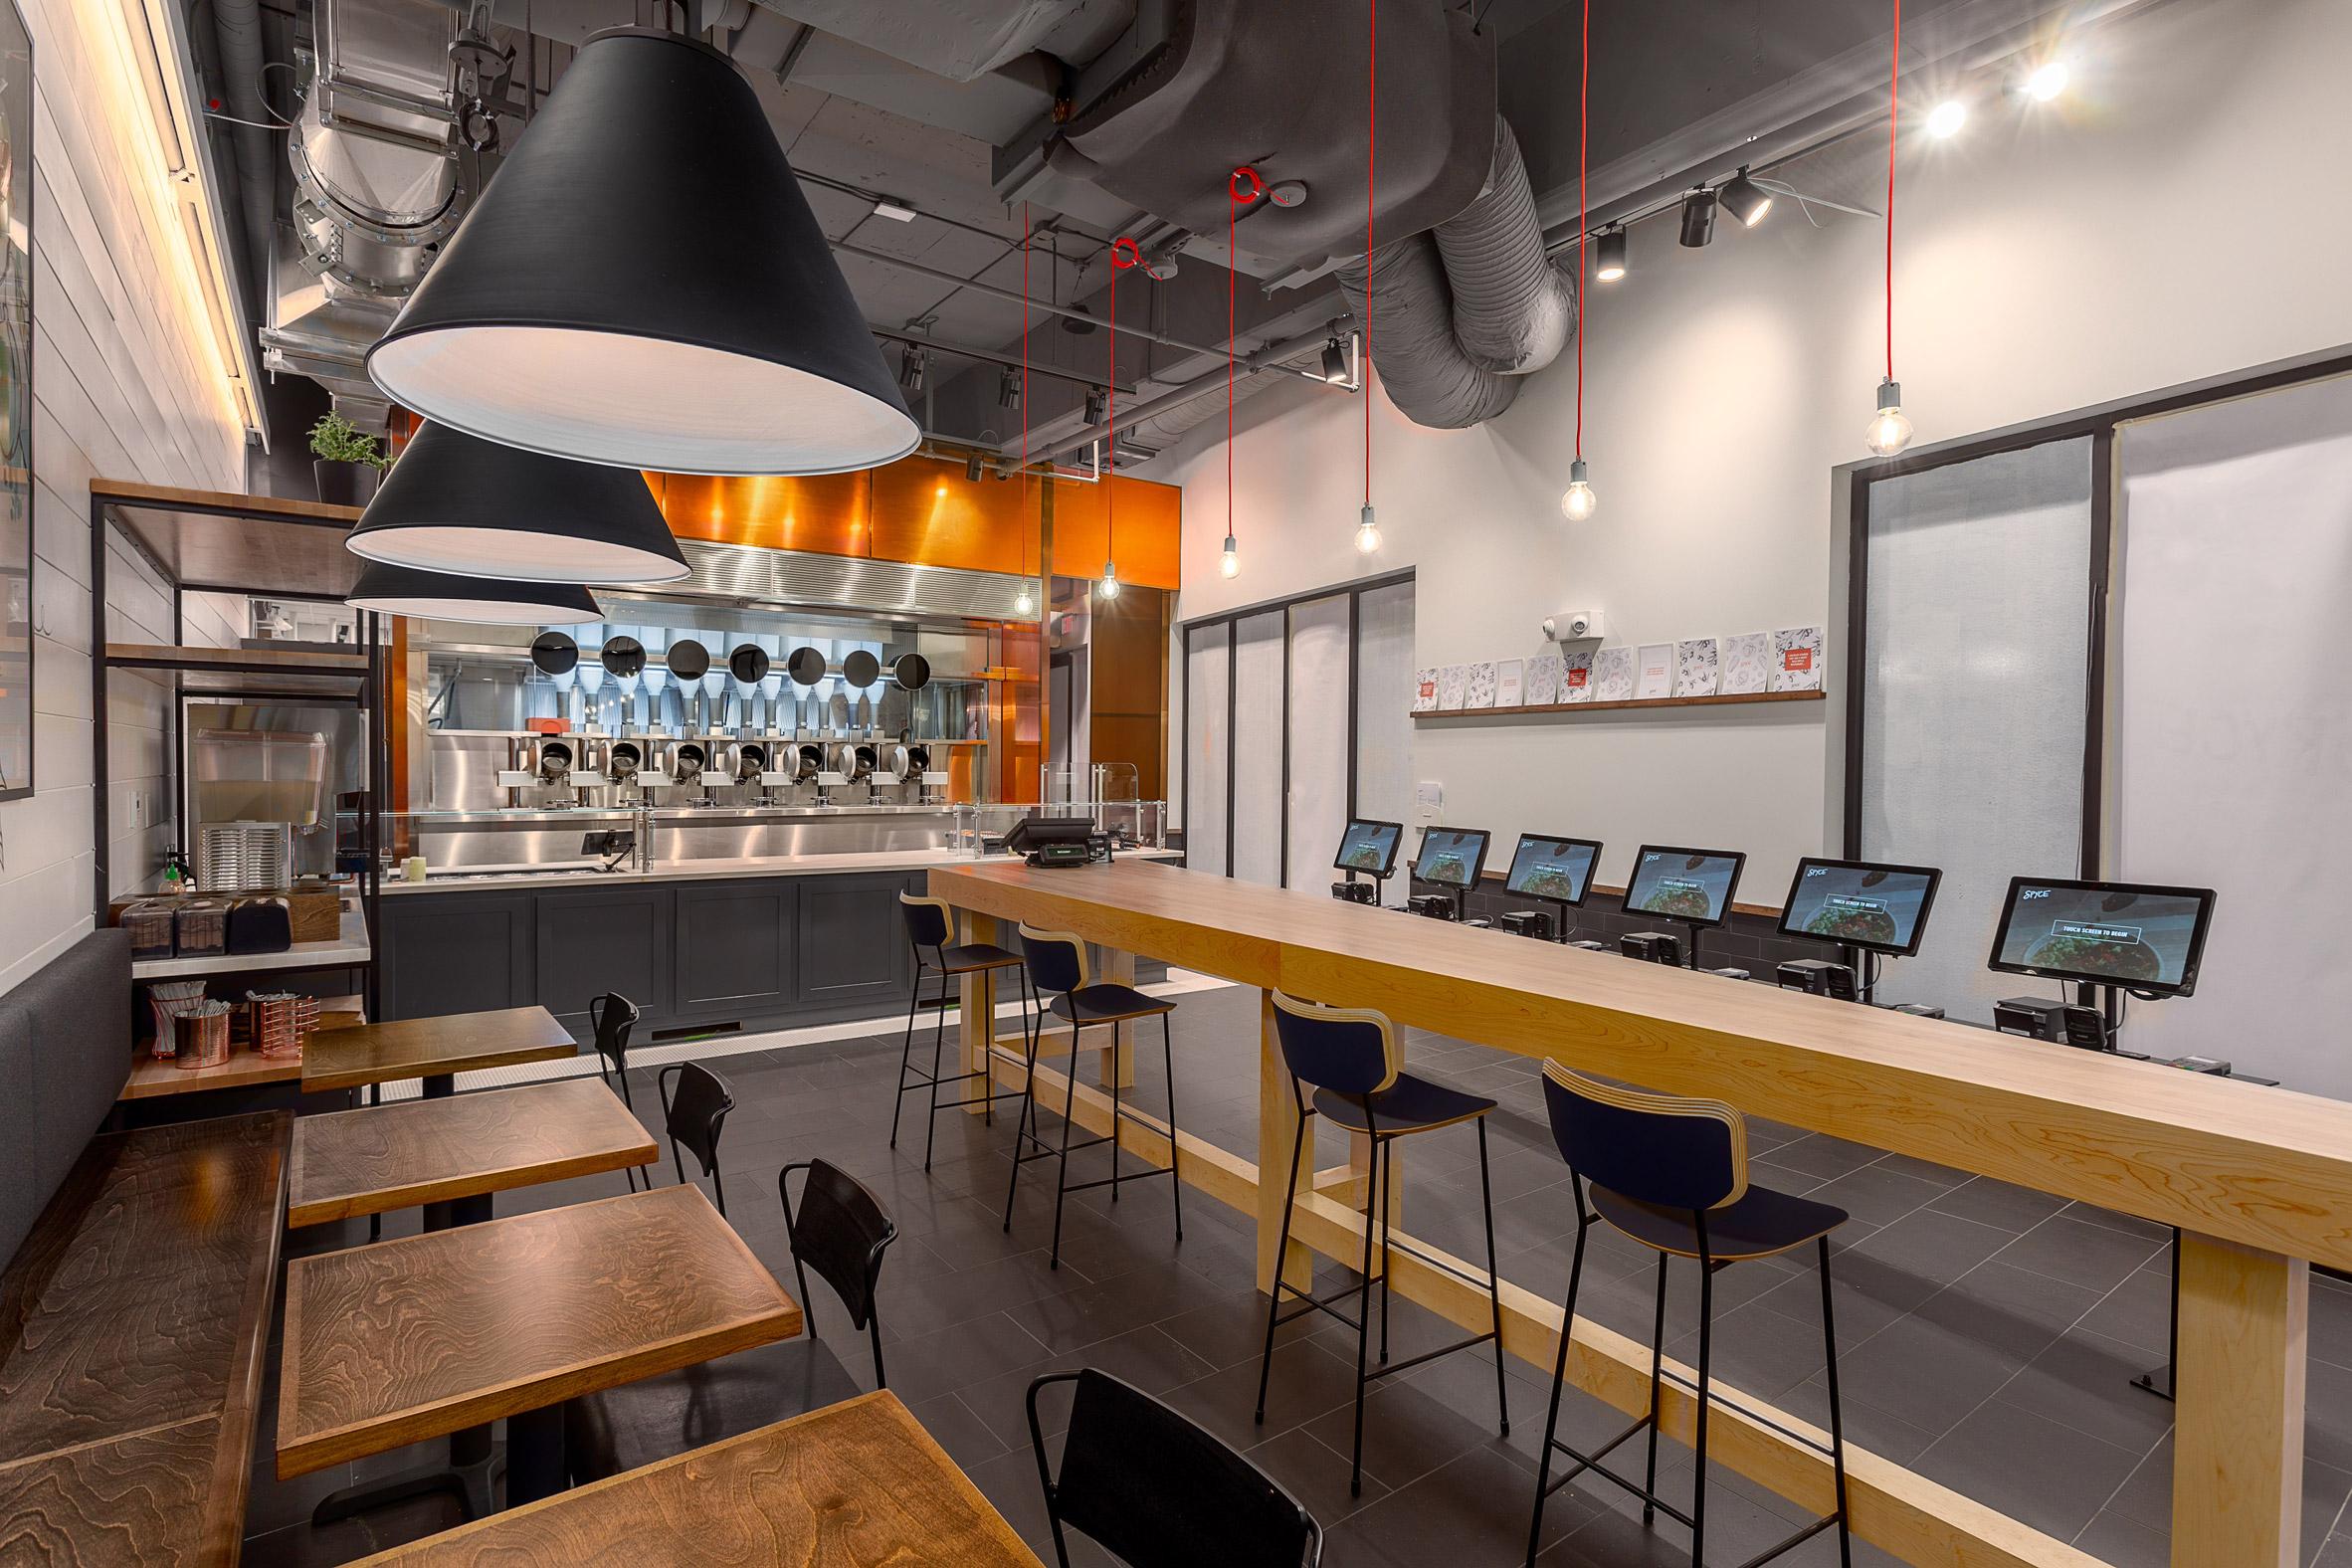 Interior shot of robotic restaurant